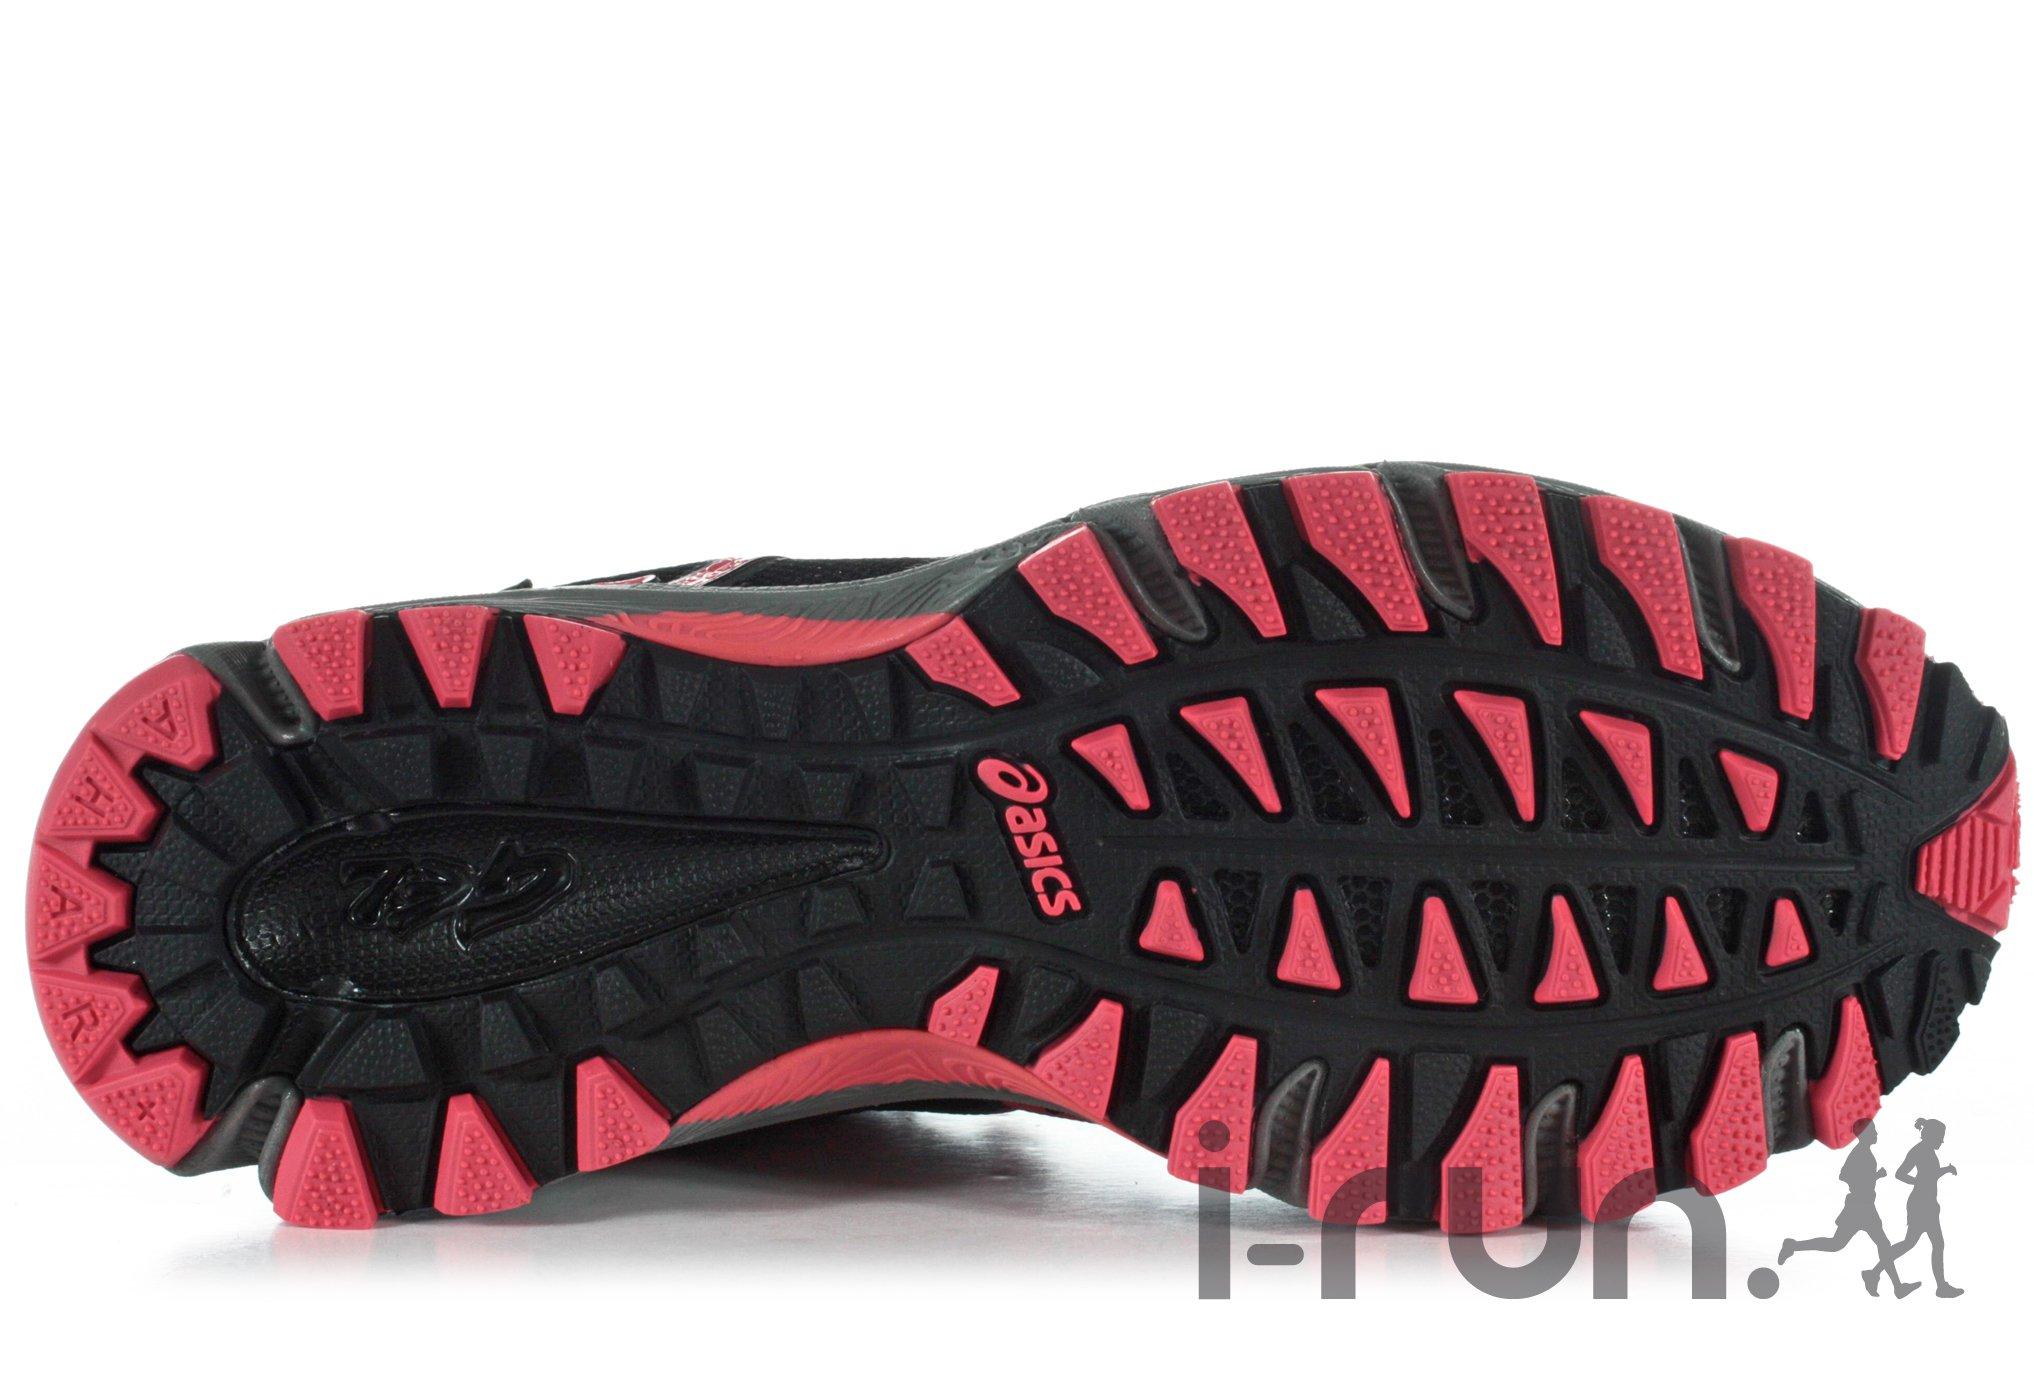 chaussures asics gel fuji attack 2 gore tex